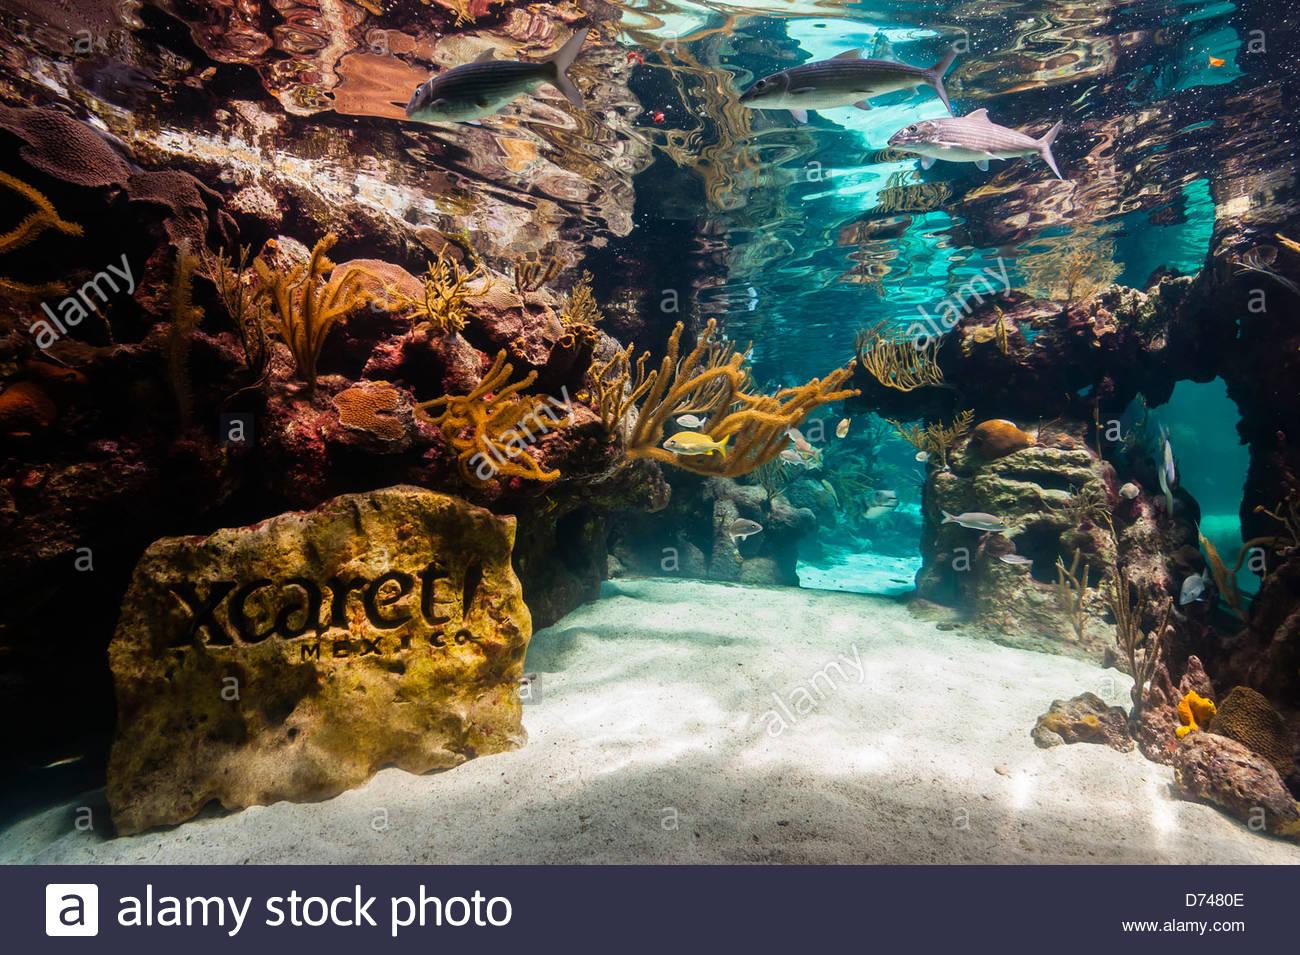 Korallenriff-Aquarium, Xcaret Park (Eco-archäologischen Themenpark), Riviera Maya, Quintana Roo, Mexiko Stockbild